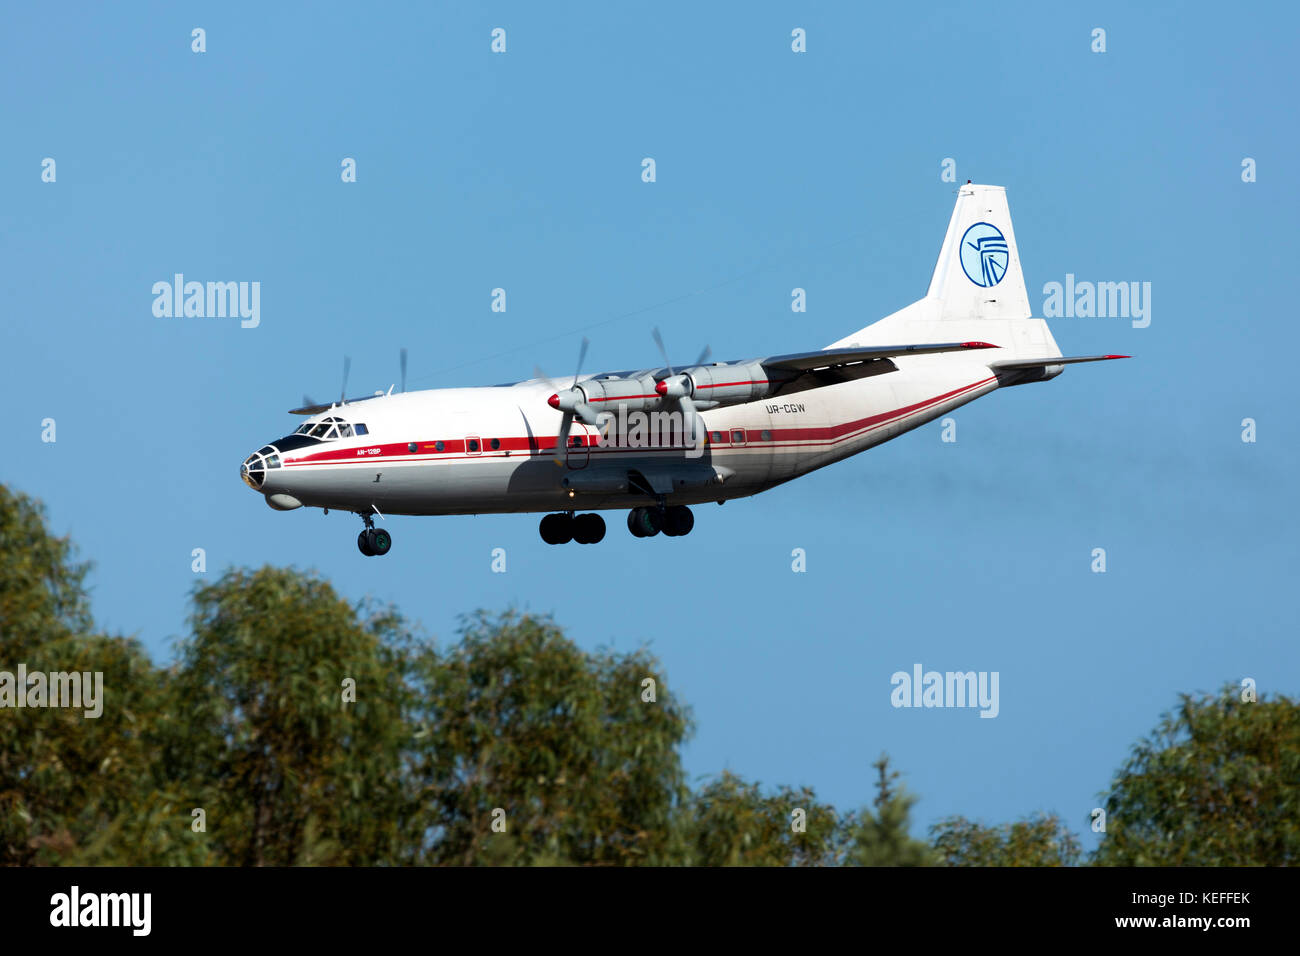 Ukraine Air Alliance Antonov An-12BP [UR-CGW] on short finals runway 31. - Stock Image